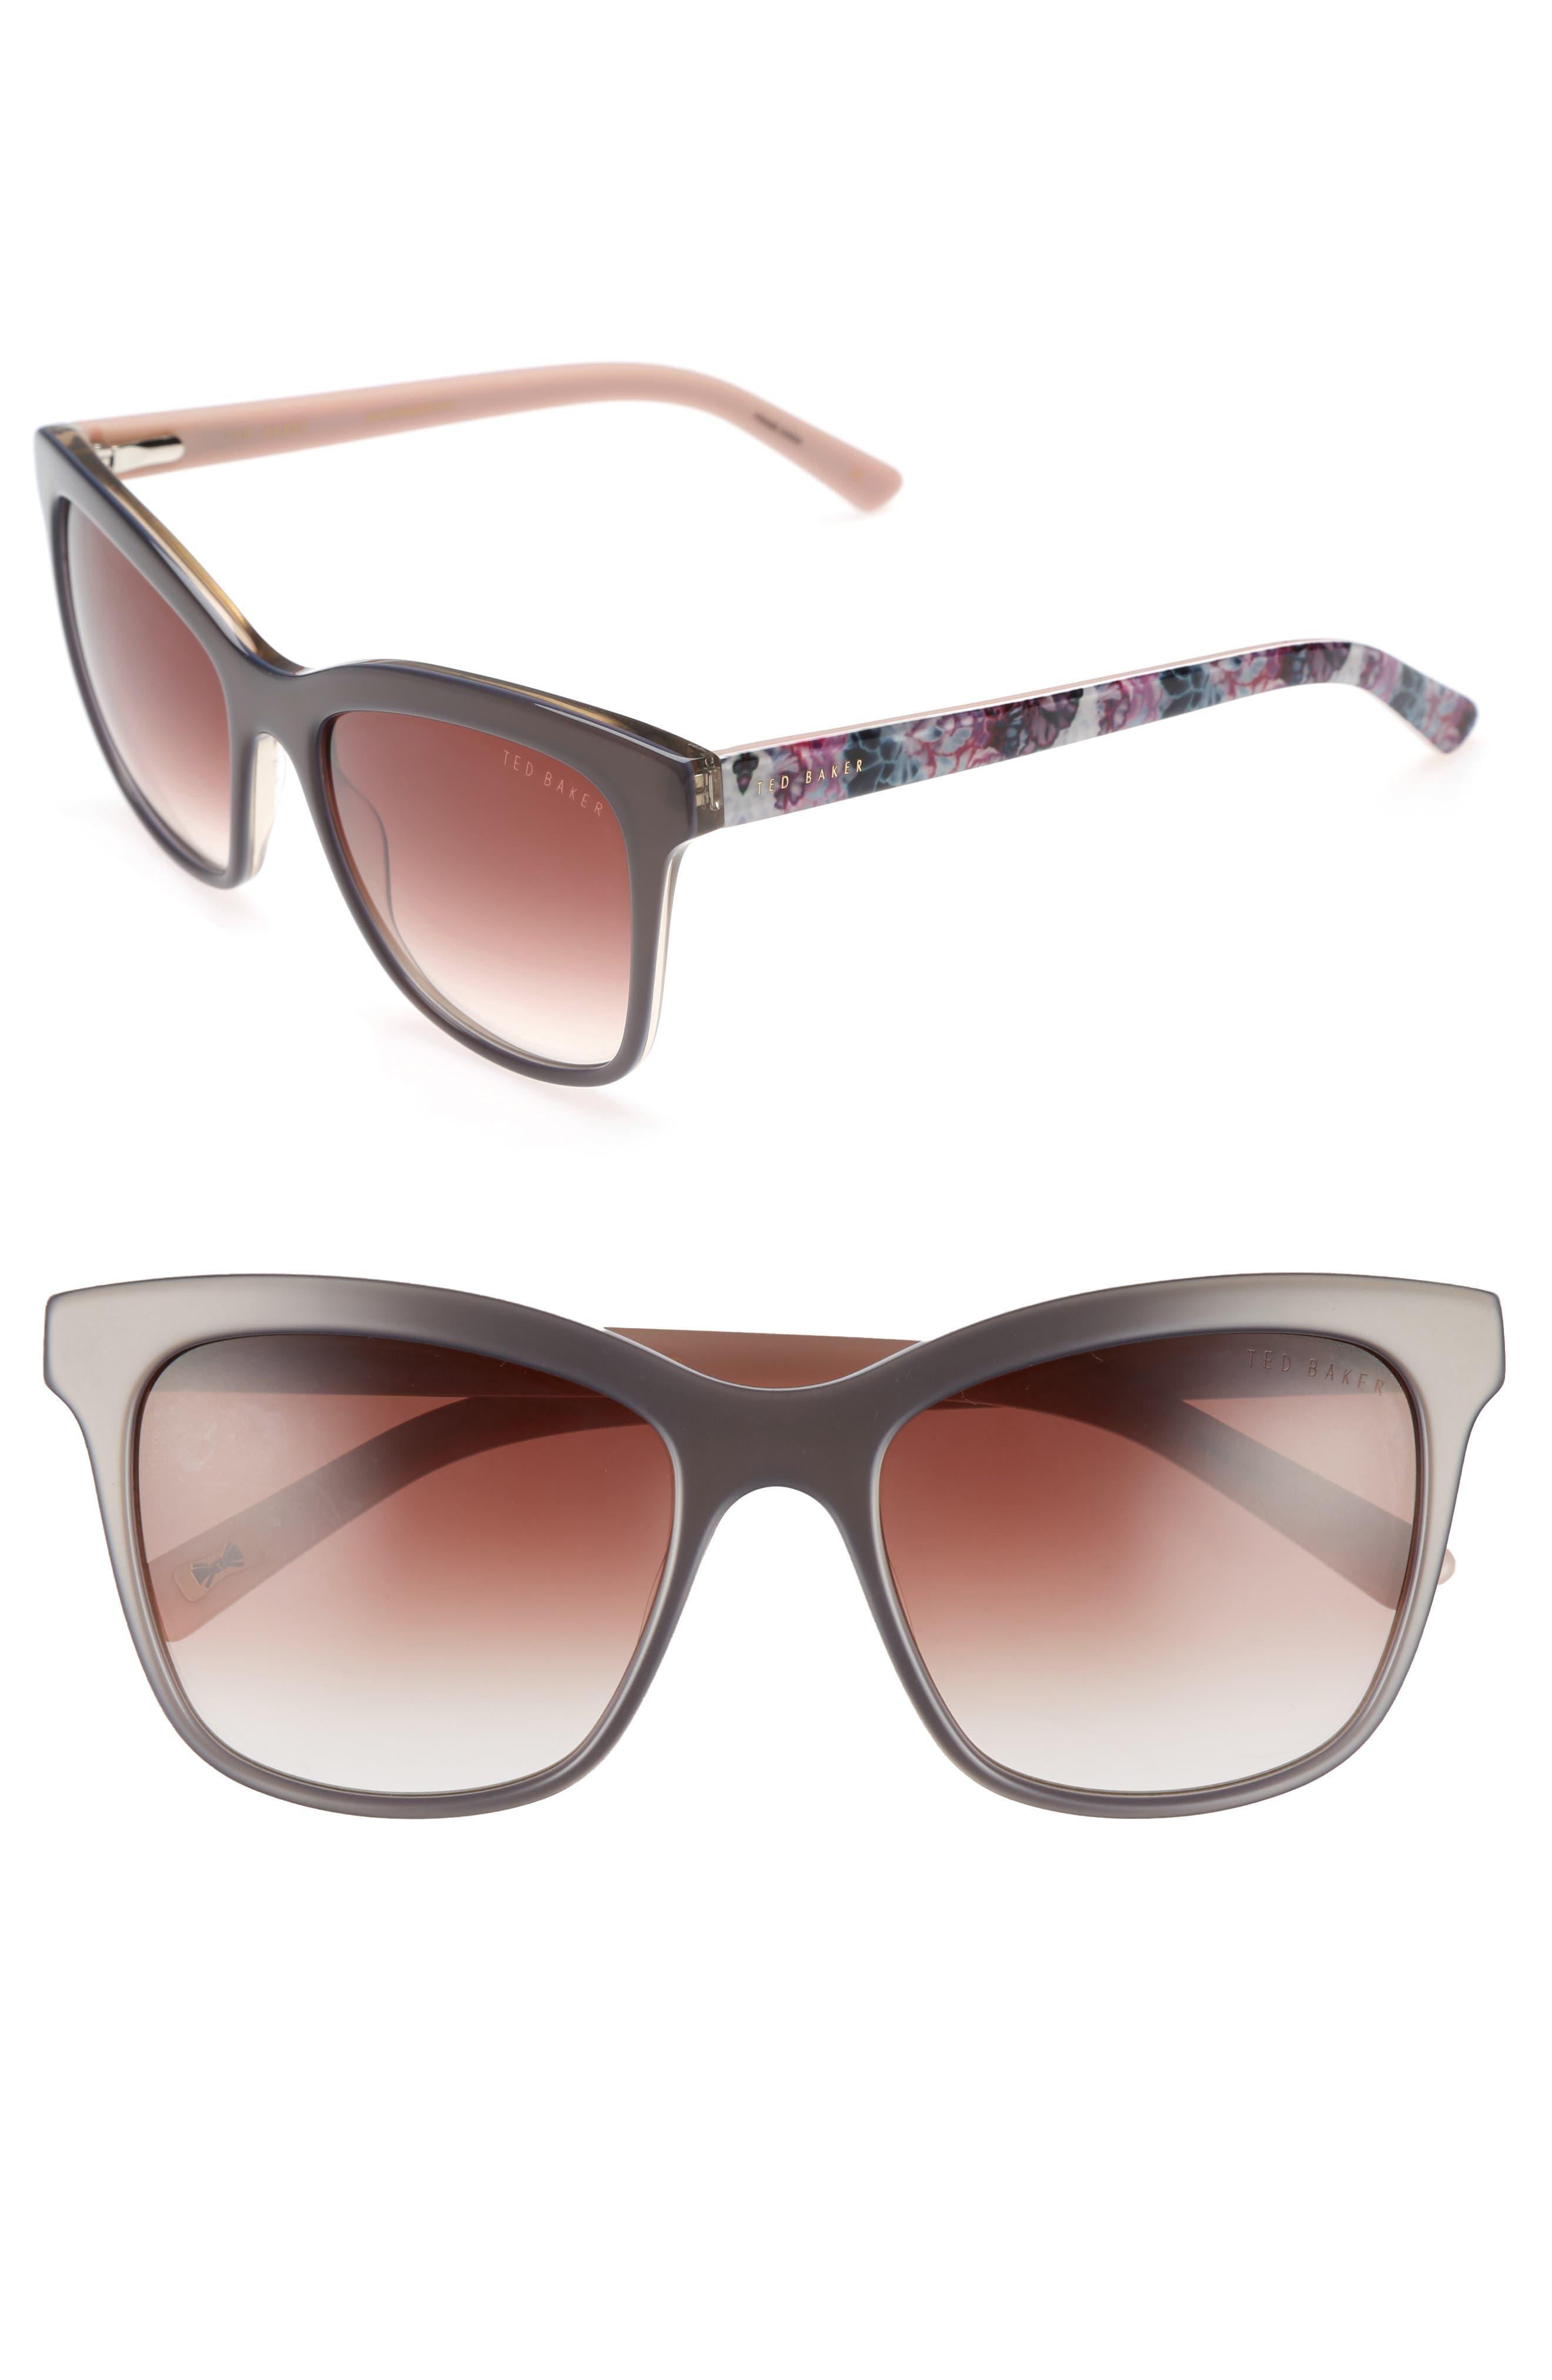 55mm Cat Eye Sunglasses,                             Main thumbnail 1, color,                             GREY